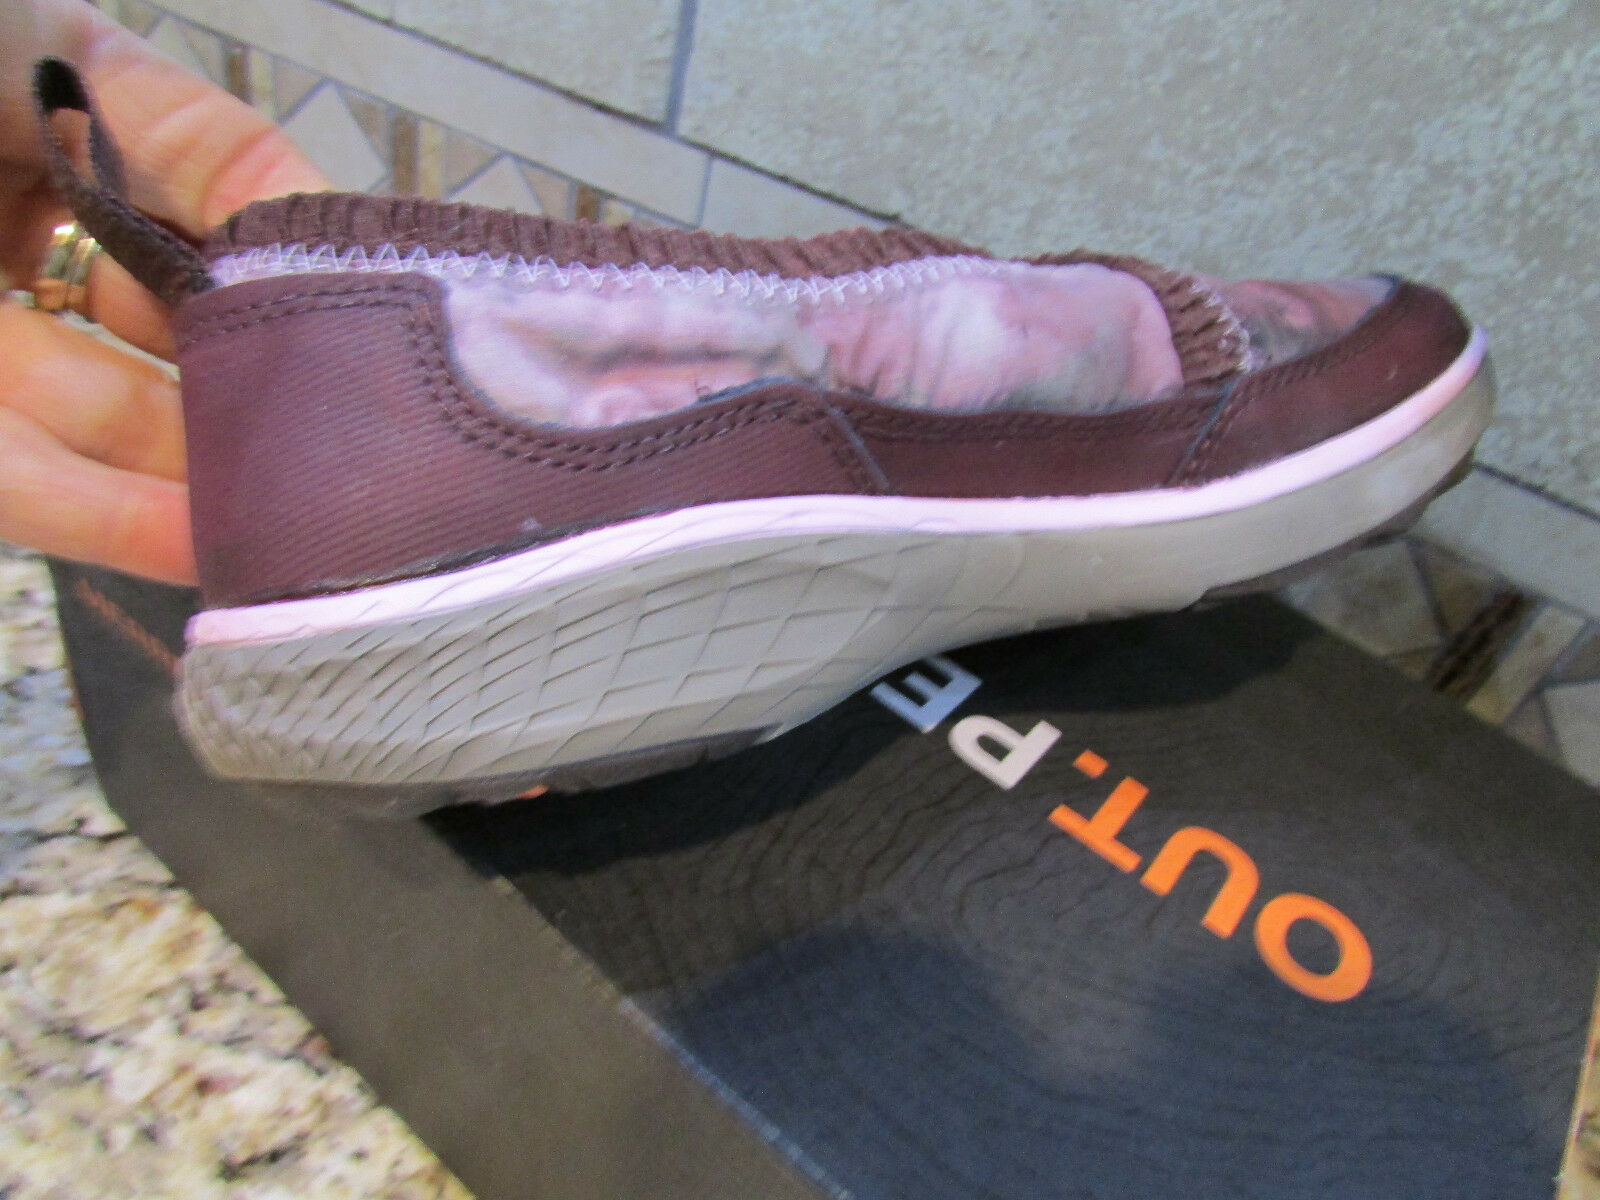 NEW MERRELL PECHORA mujer WRAP SLIP ON LOAFER zapatos mujer PECHORA 6 J42650 FREE SHIP 88fffd